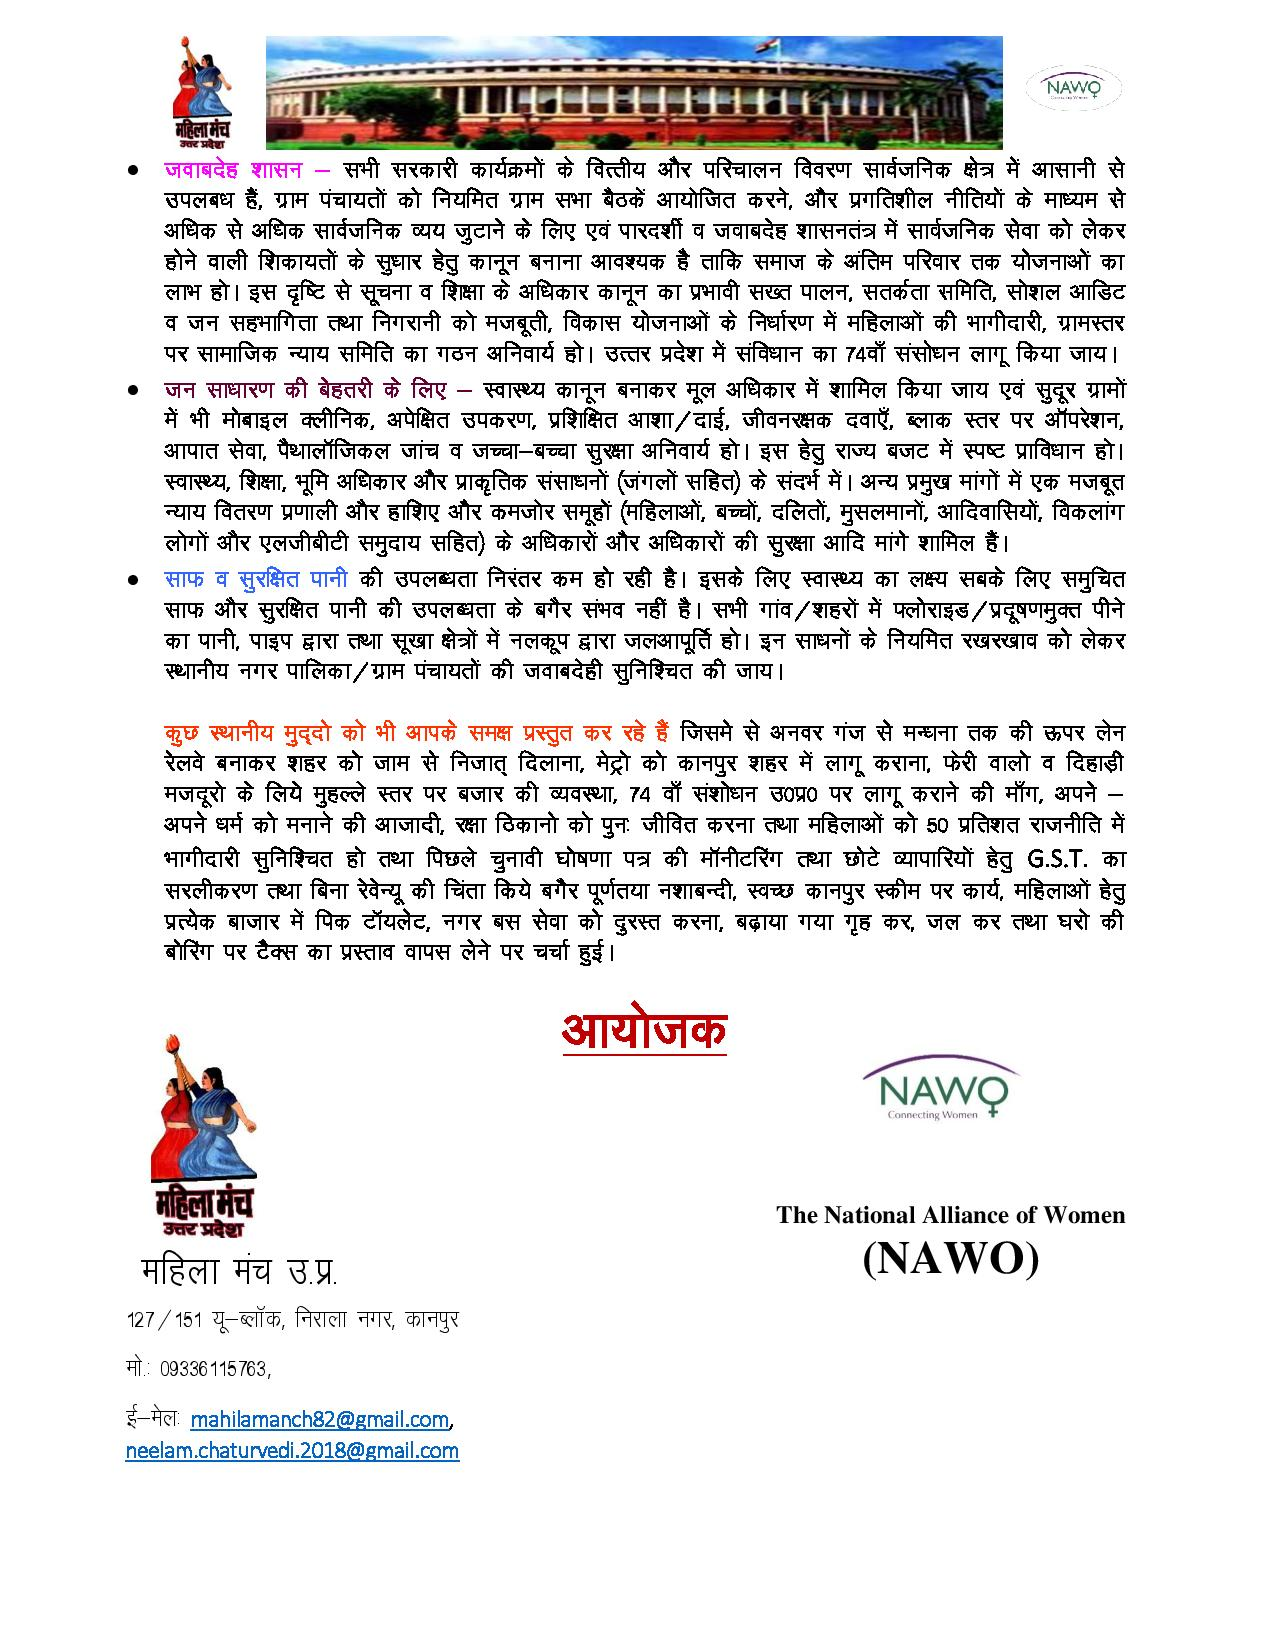 People Manifesto 2019 (Mahila Manch & NAWO) local issues.docx-page-004.jpg